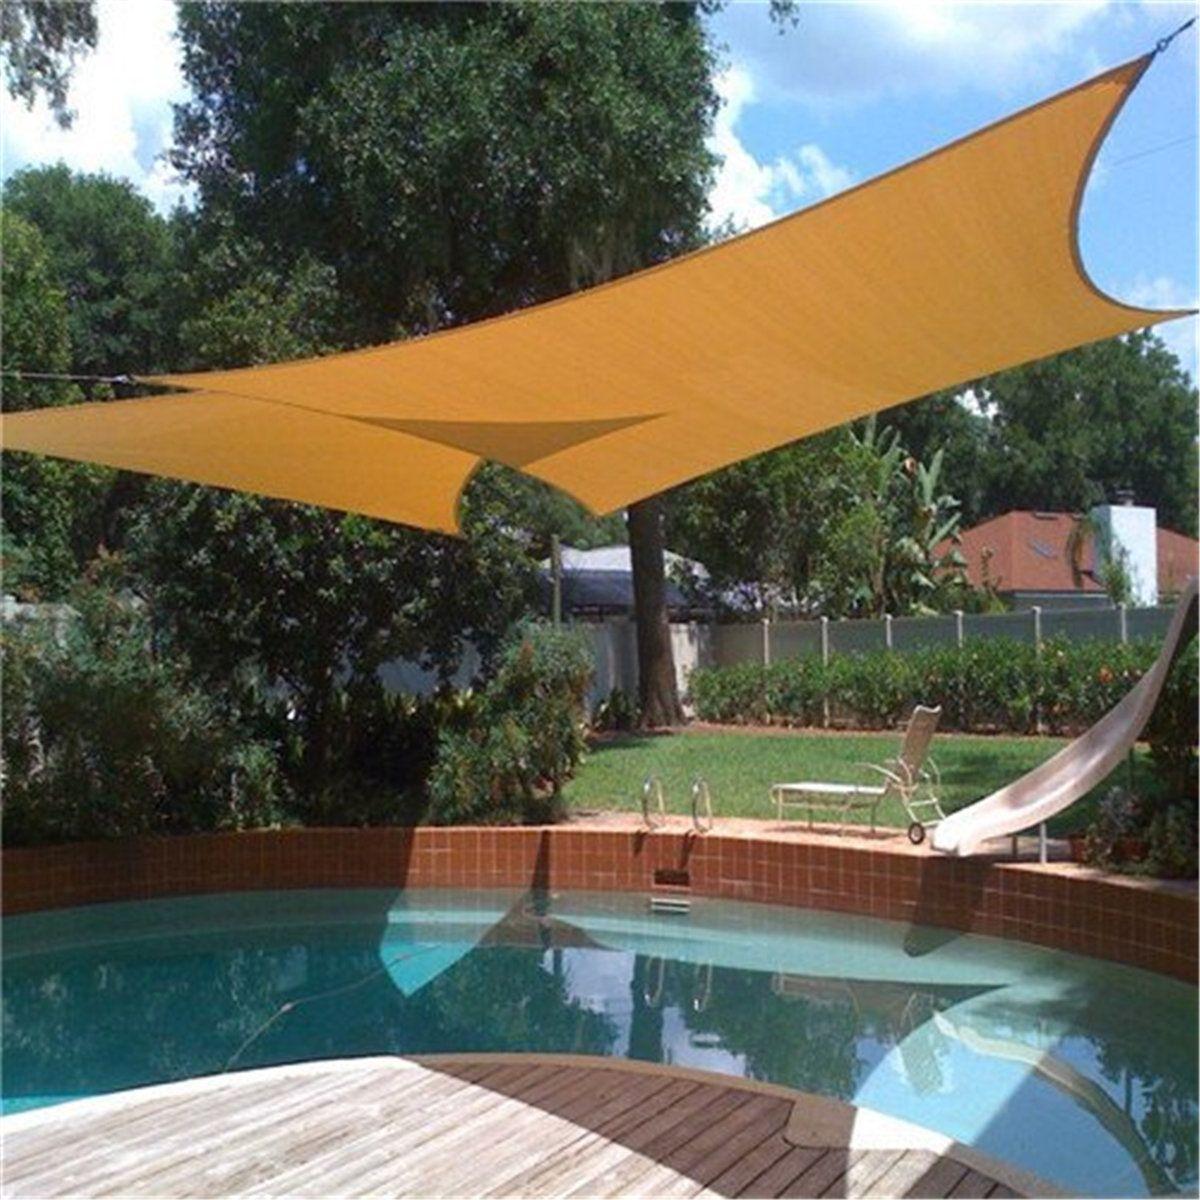 2x1 8m sun sailing shade mesh net